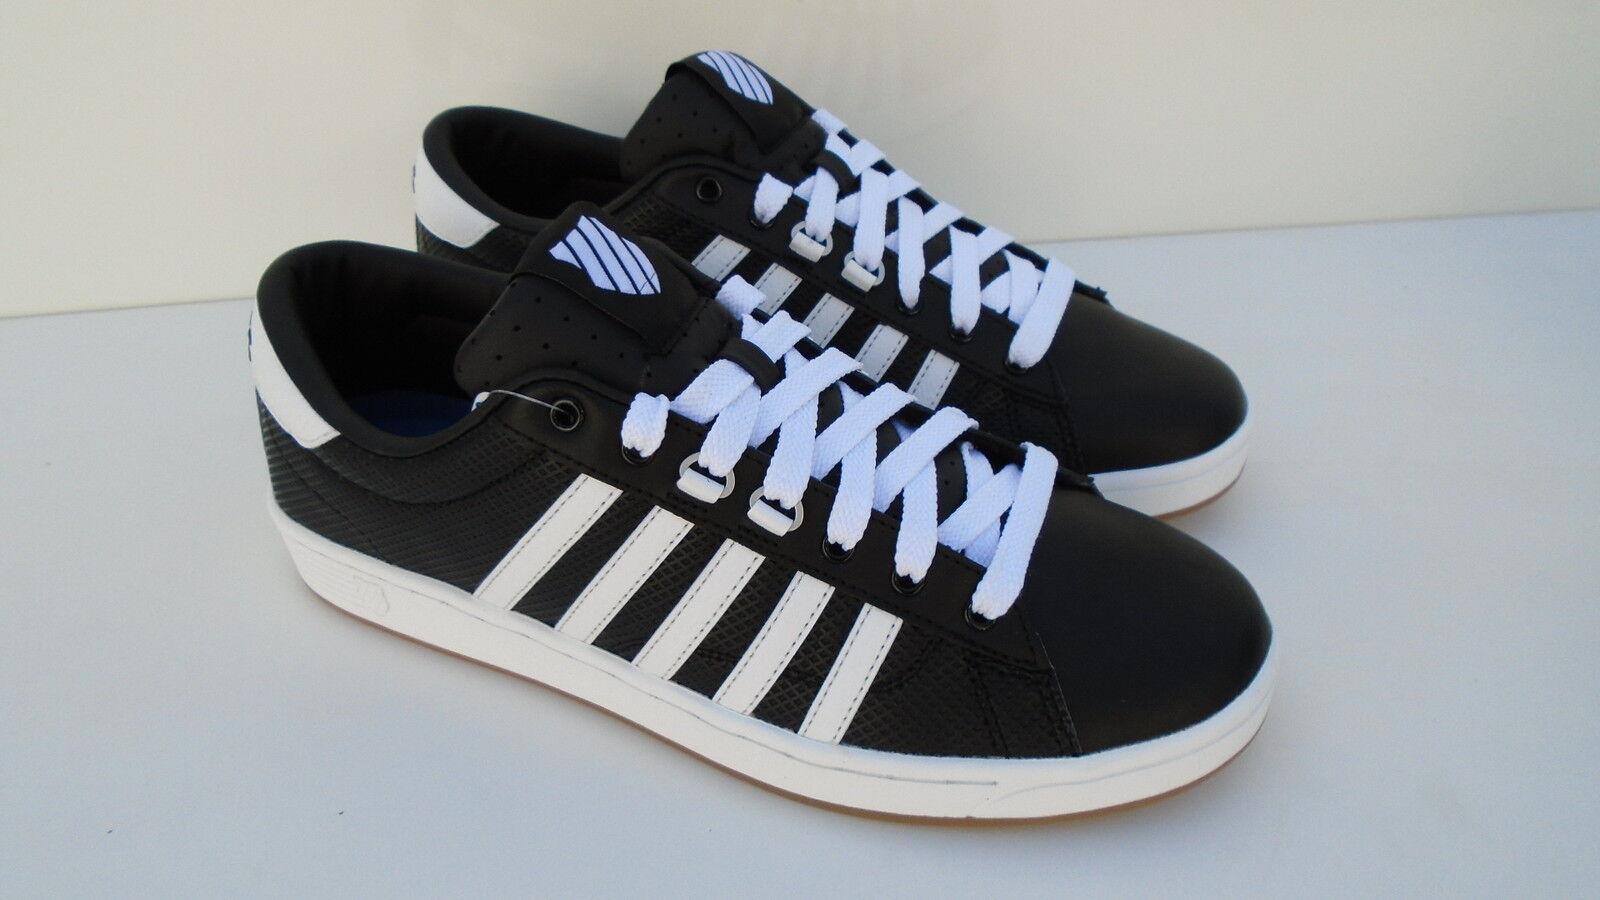 K-Swiss Chaussures Hommes Noir Blanc Hoke EQ CMF Sneaker Sneaker Sneaker Chaussures de sport 47 NEUF | Valeur Formidable  c0d6fc